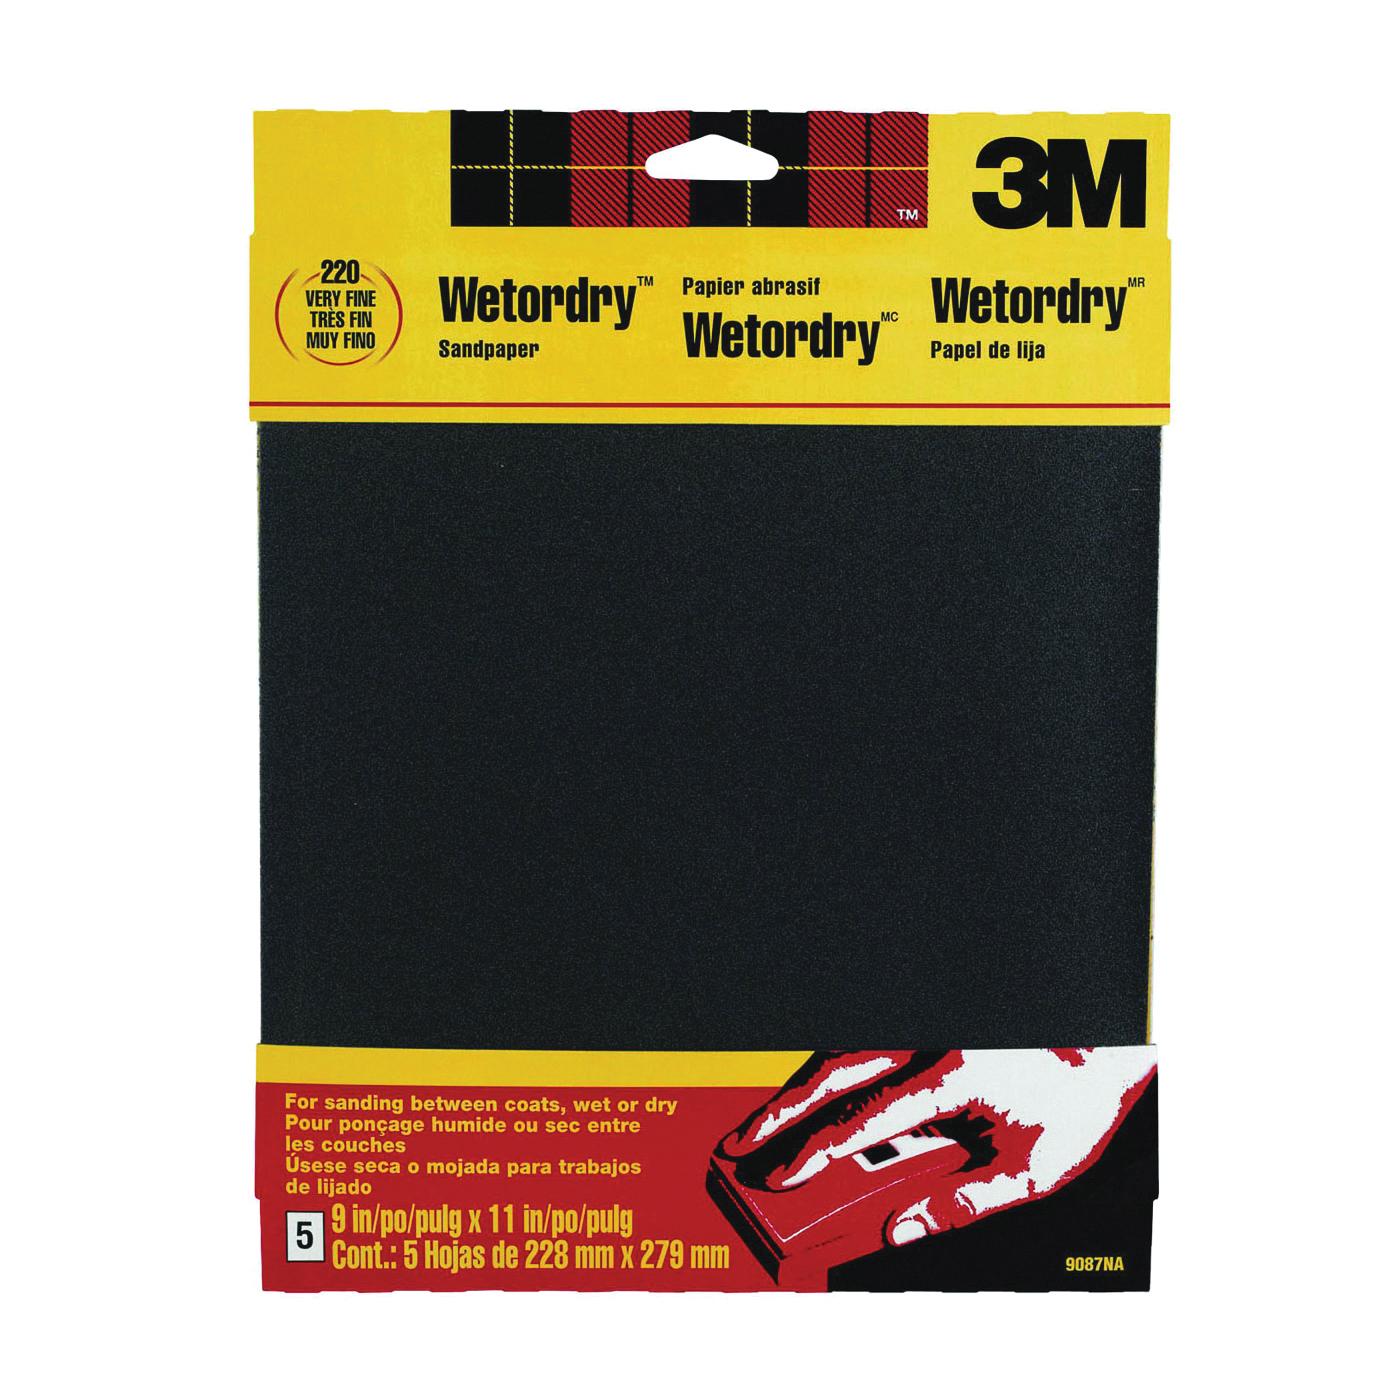 Picture of 3M 9087 Sandpaper, 11 in L, 9 in W, 220 Grit, Very Fine, Silicone Carbide Abrasive